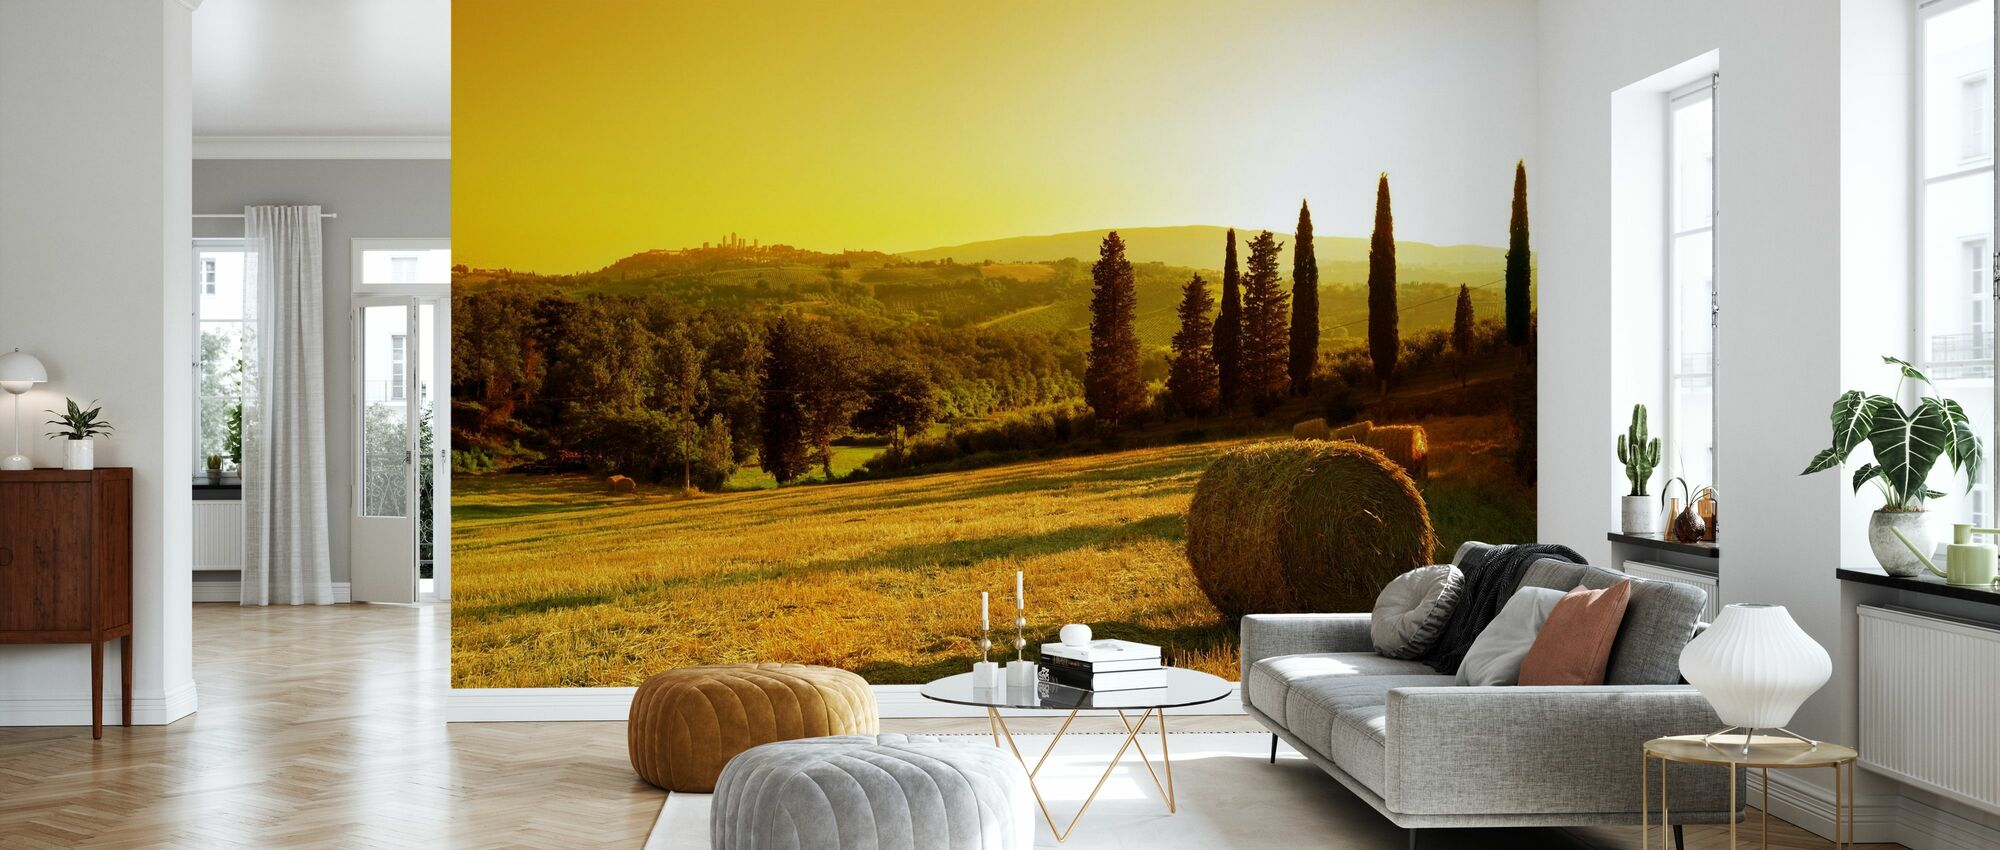 Sunset Tuscany Landscape - Wallpaper - Living Room